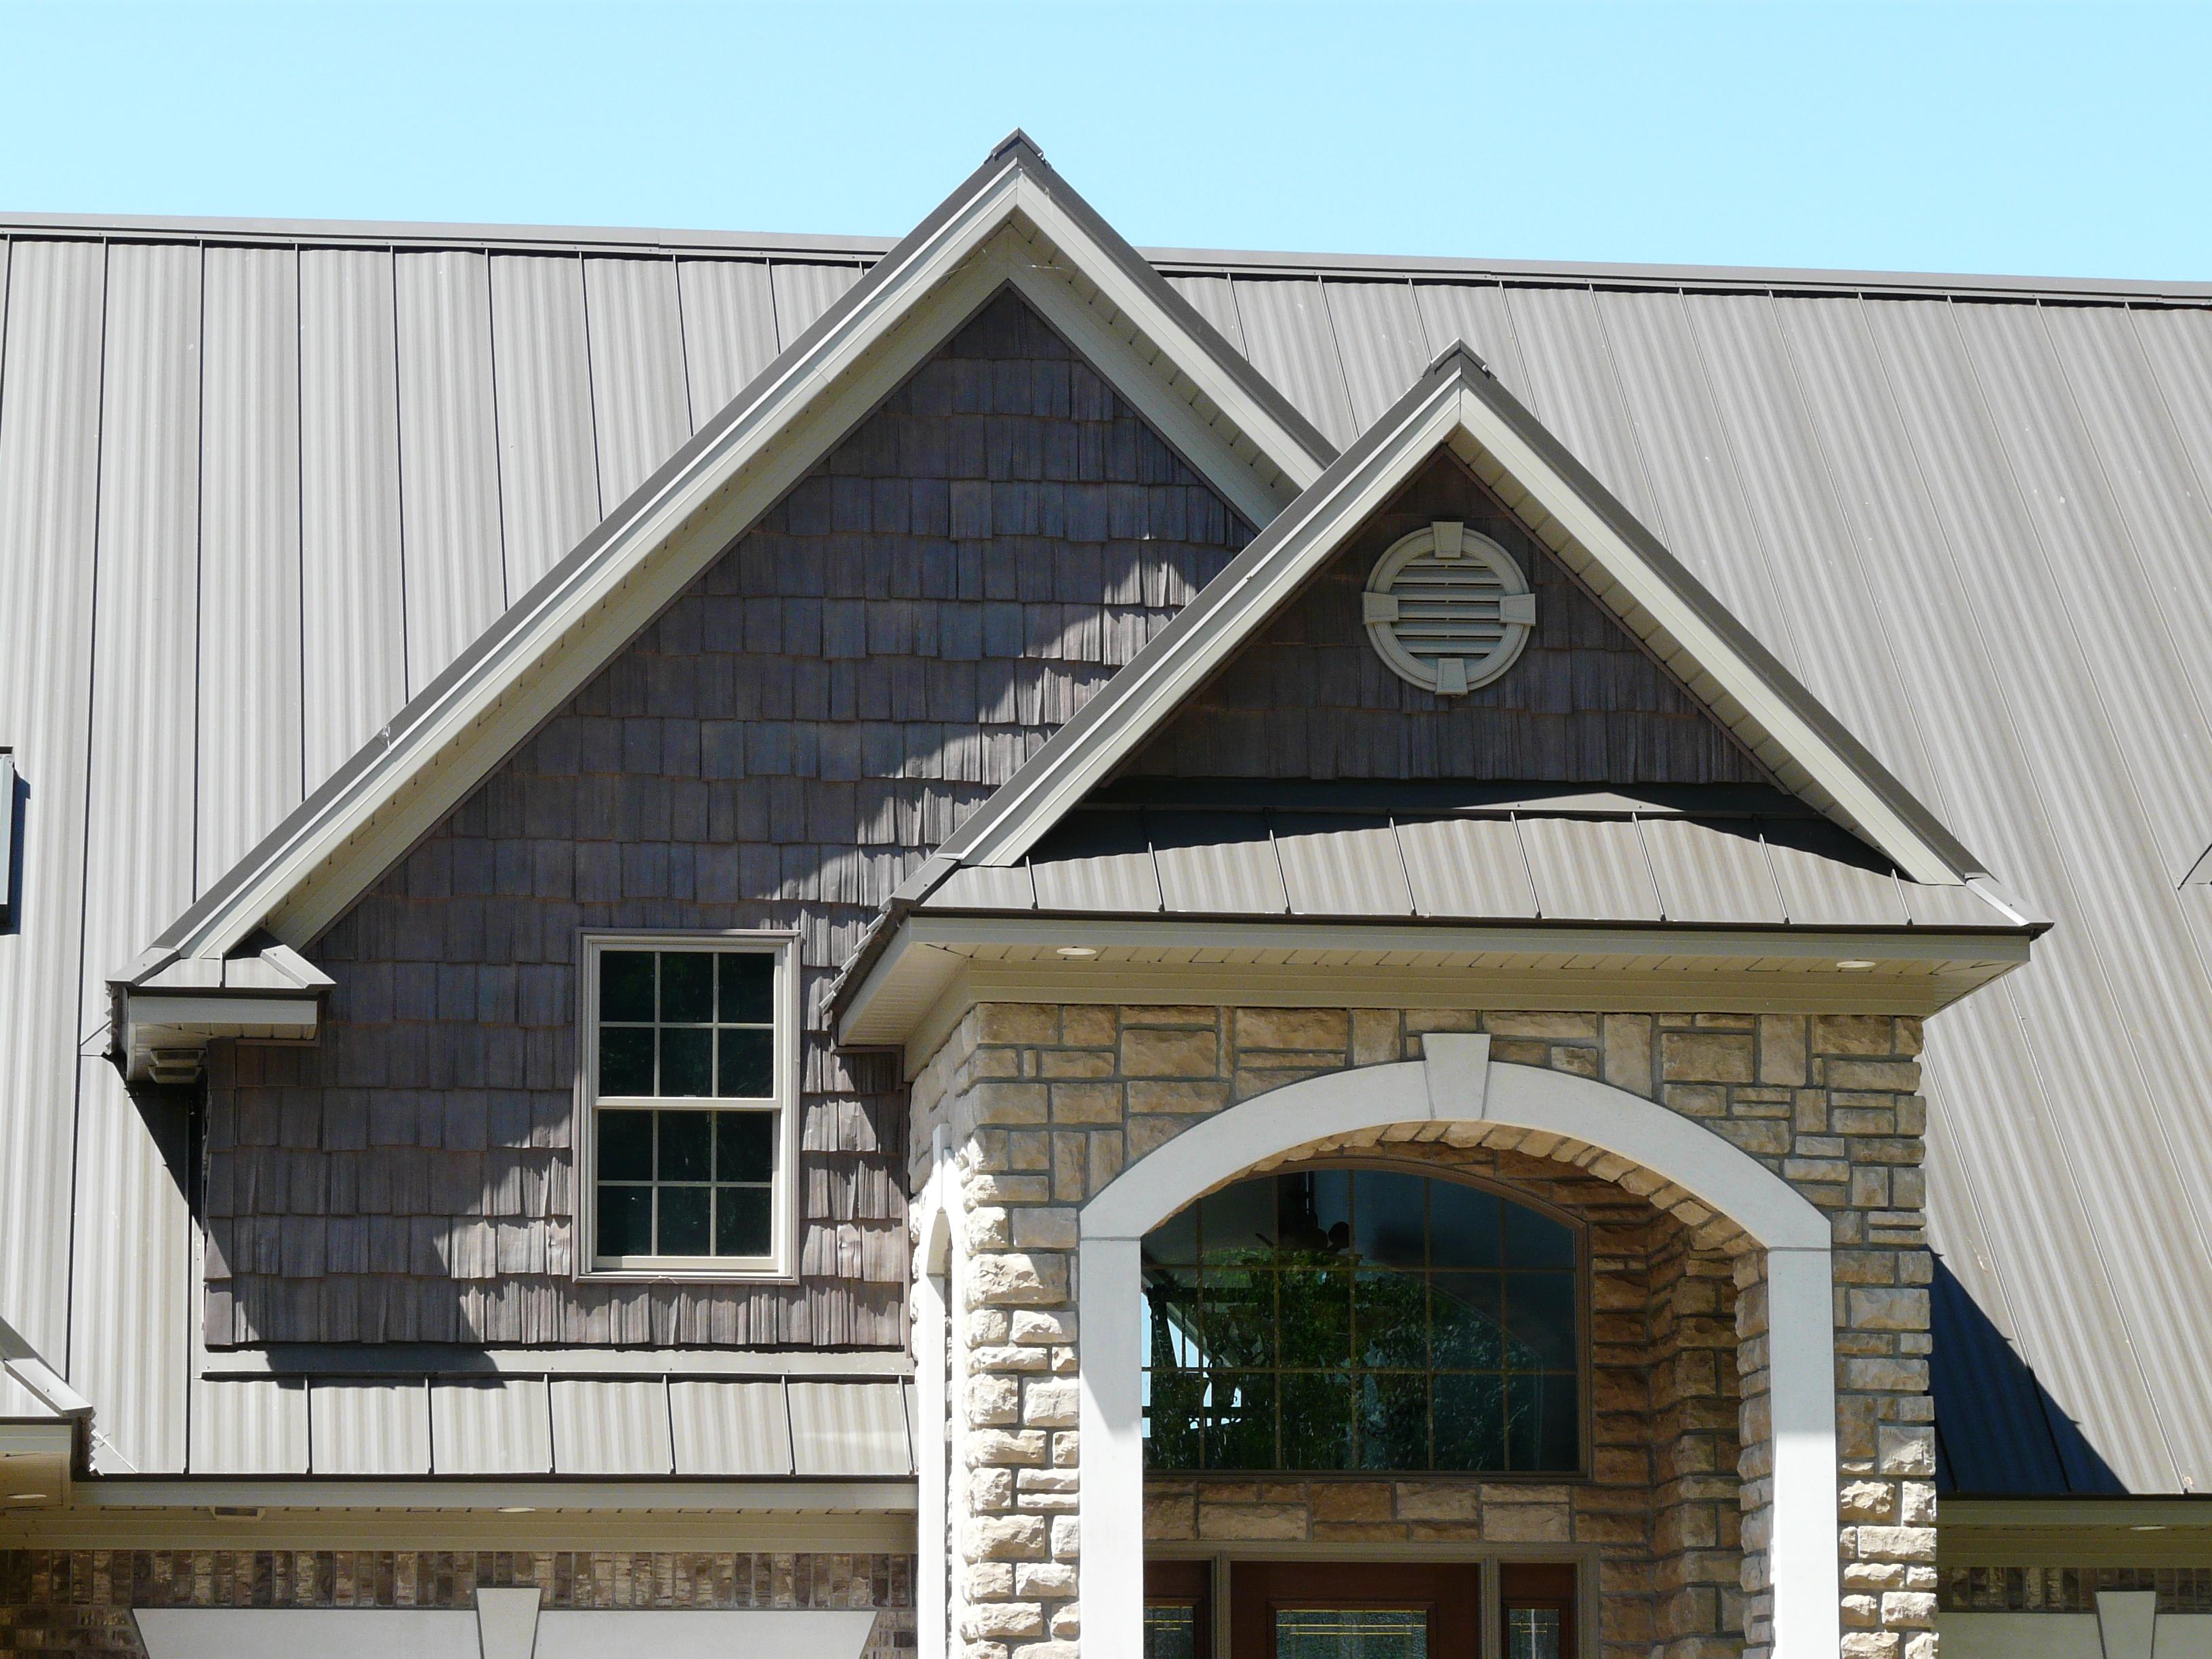 SLR Standing Seam Roof